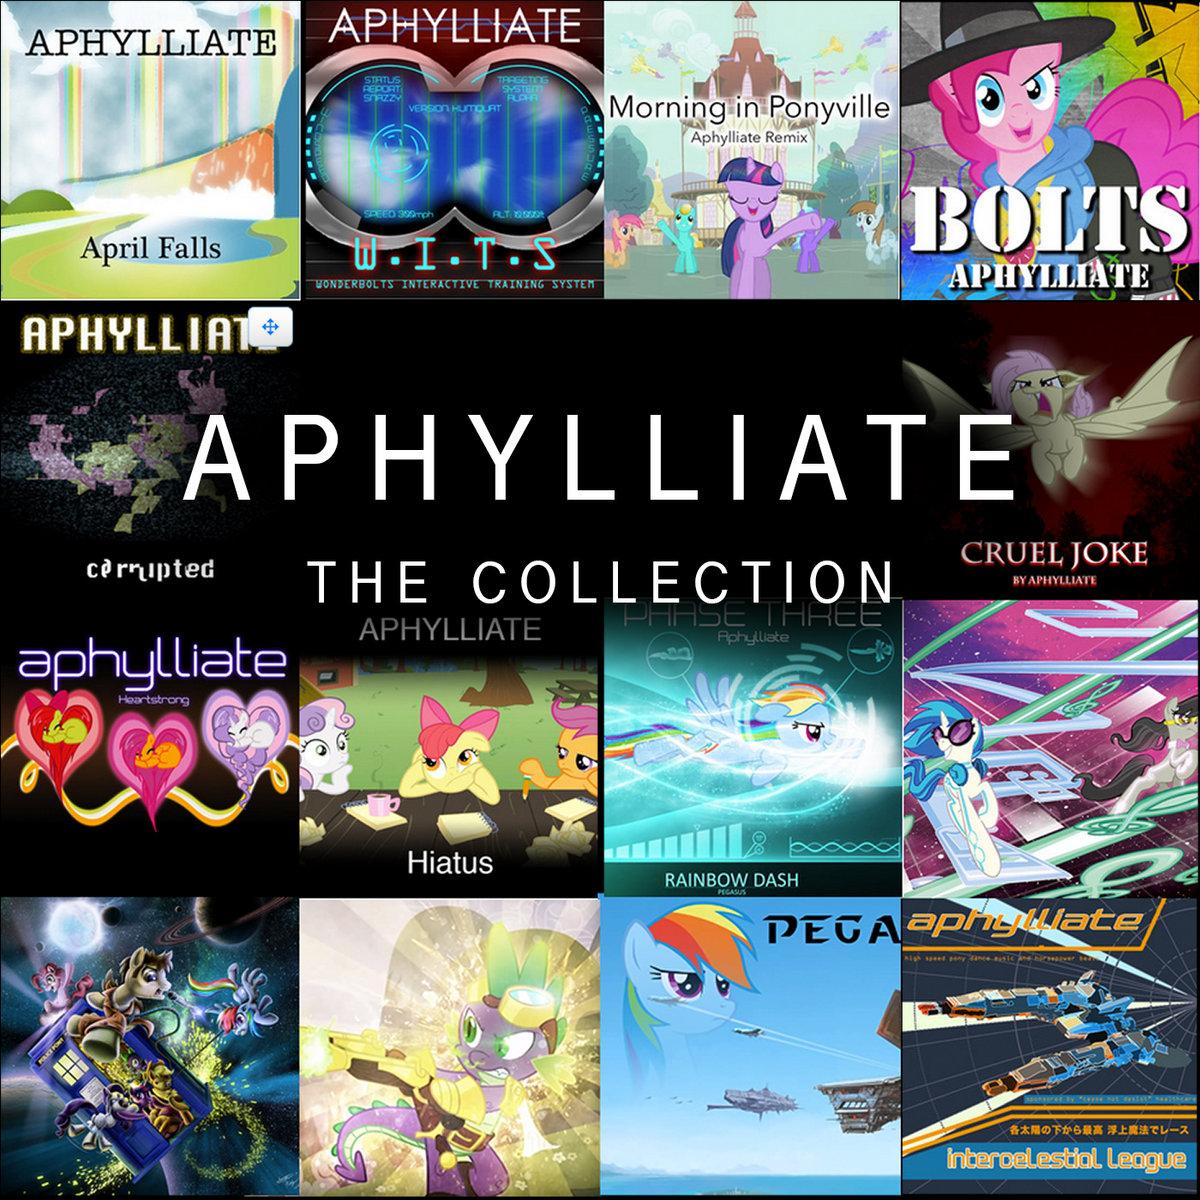 Aphylliate